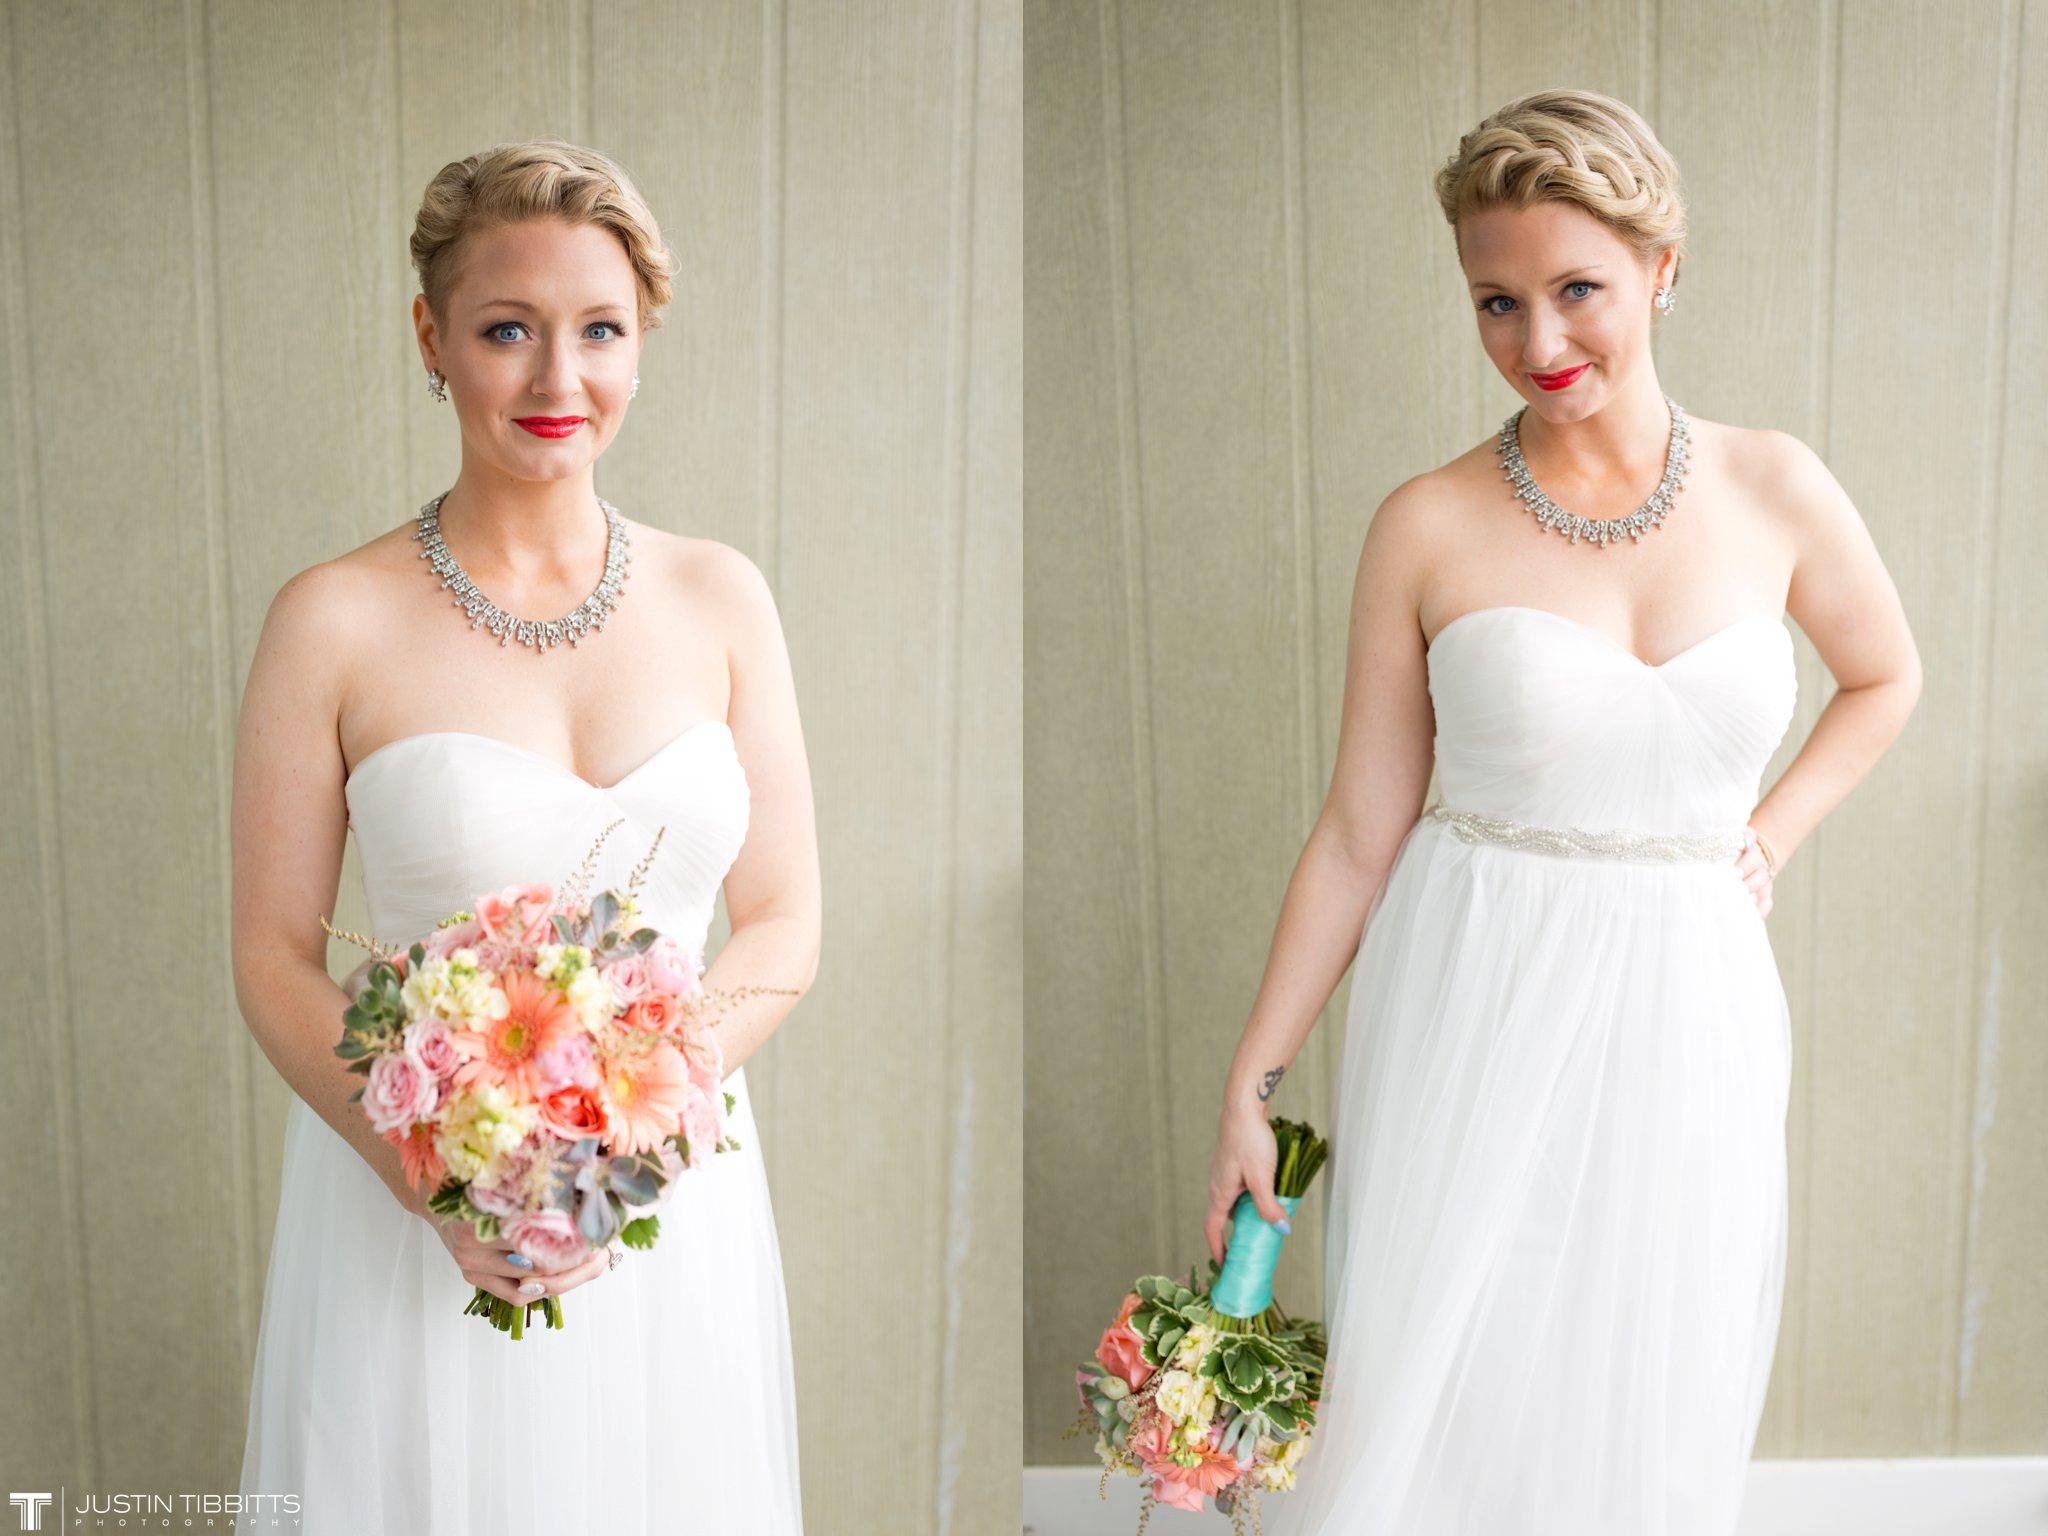 burlap-and-beams-wedding-photos-with-joran-and-molly_0029